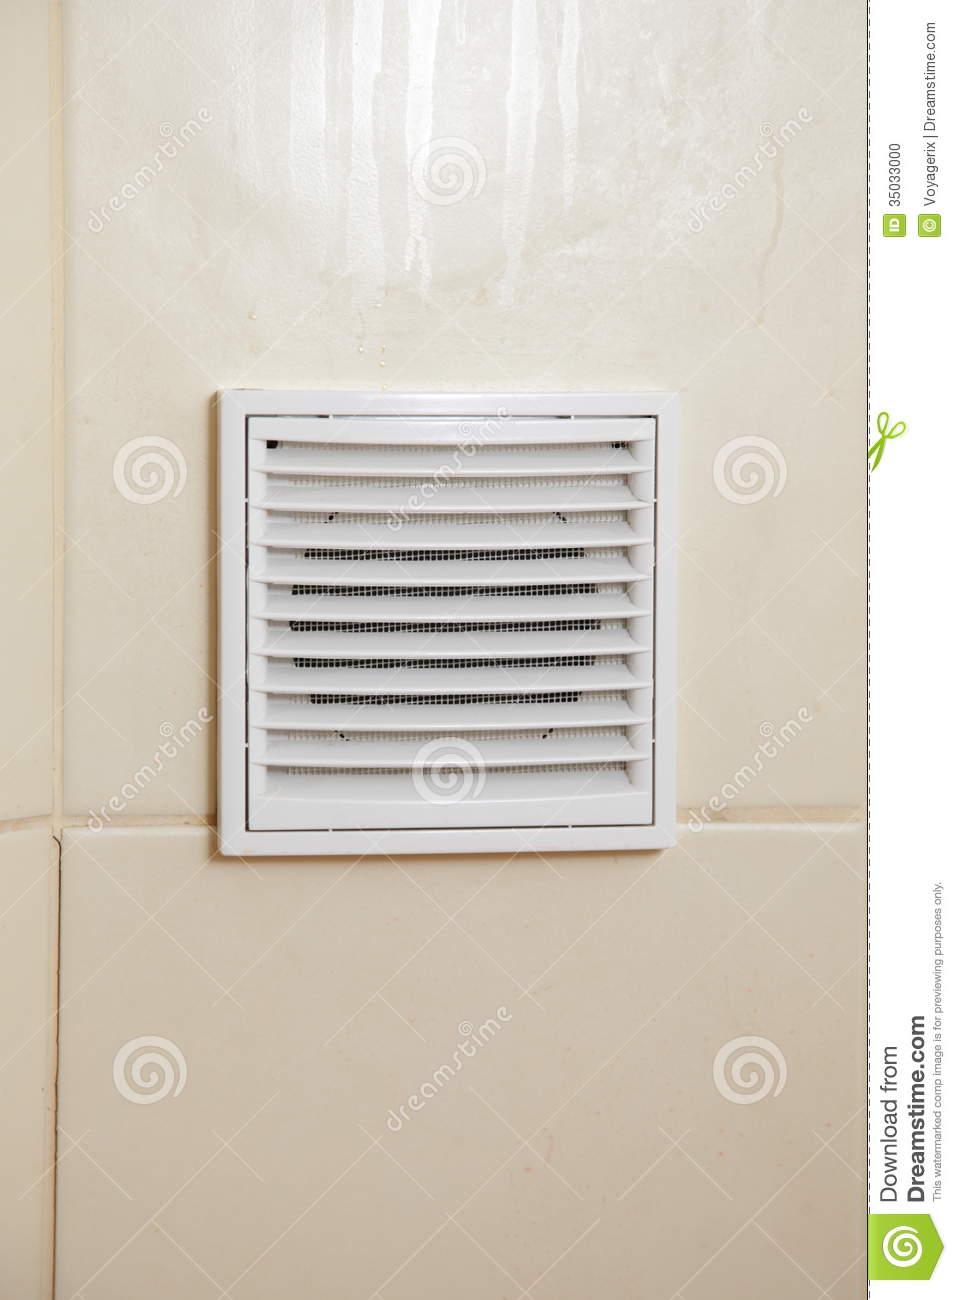 Vent White Bathroom Ventilation Grille Stock Photo.